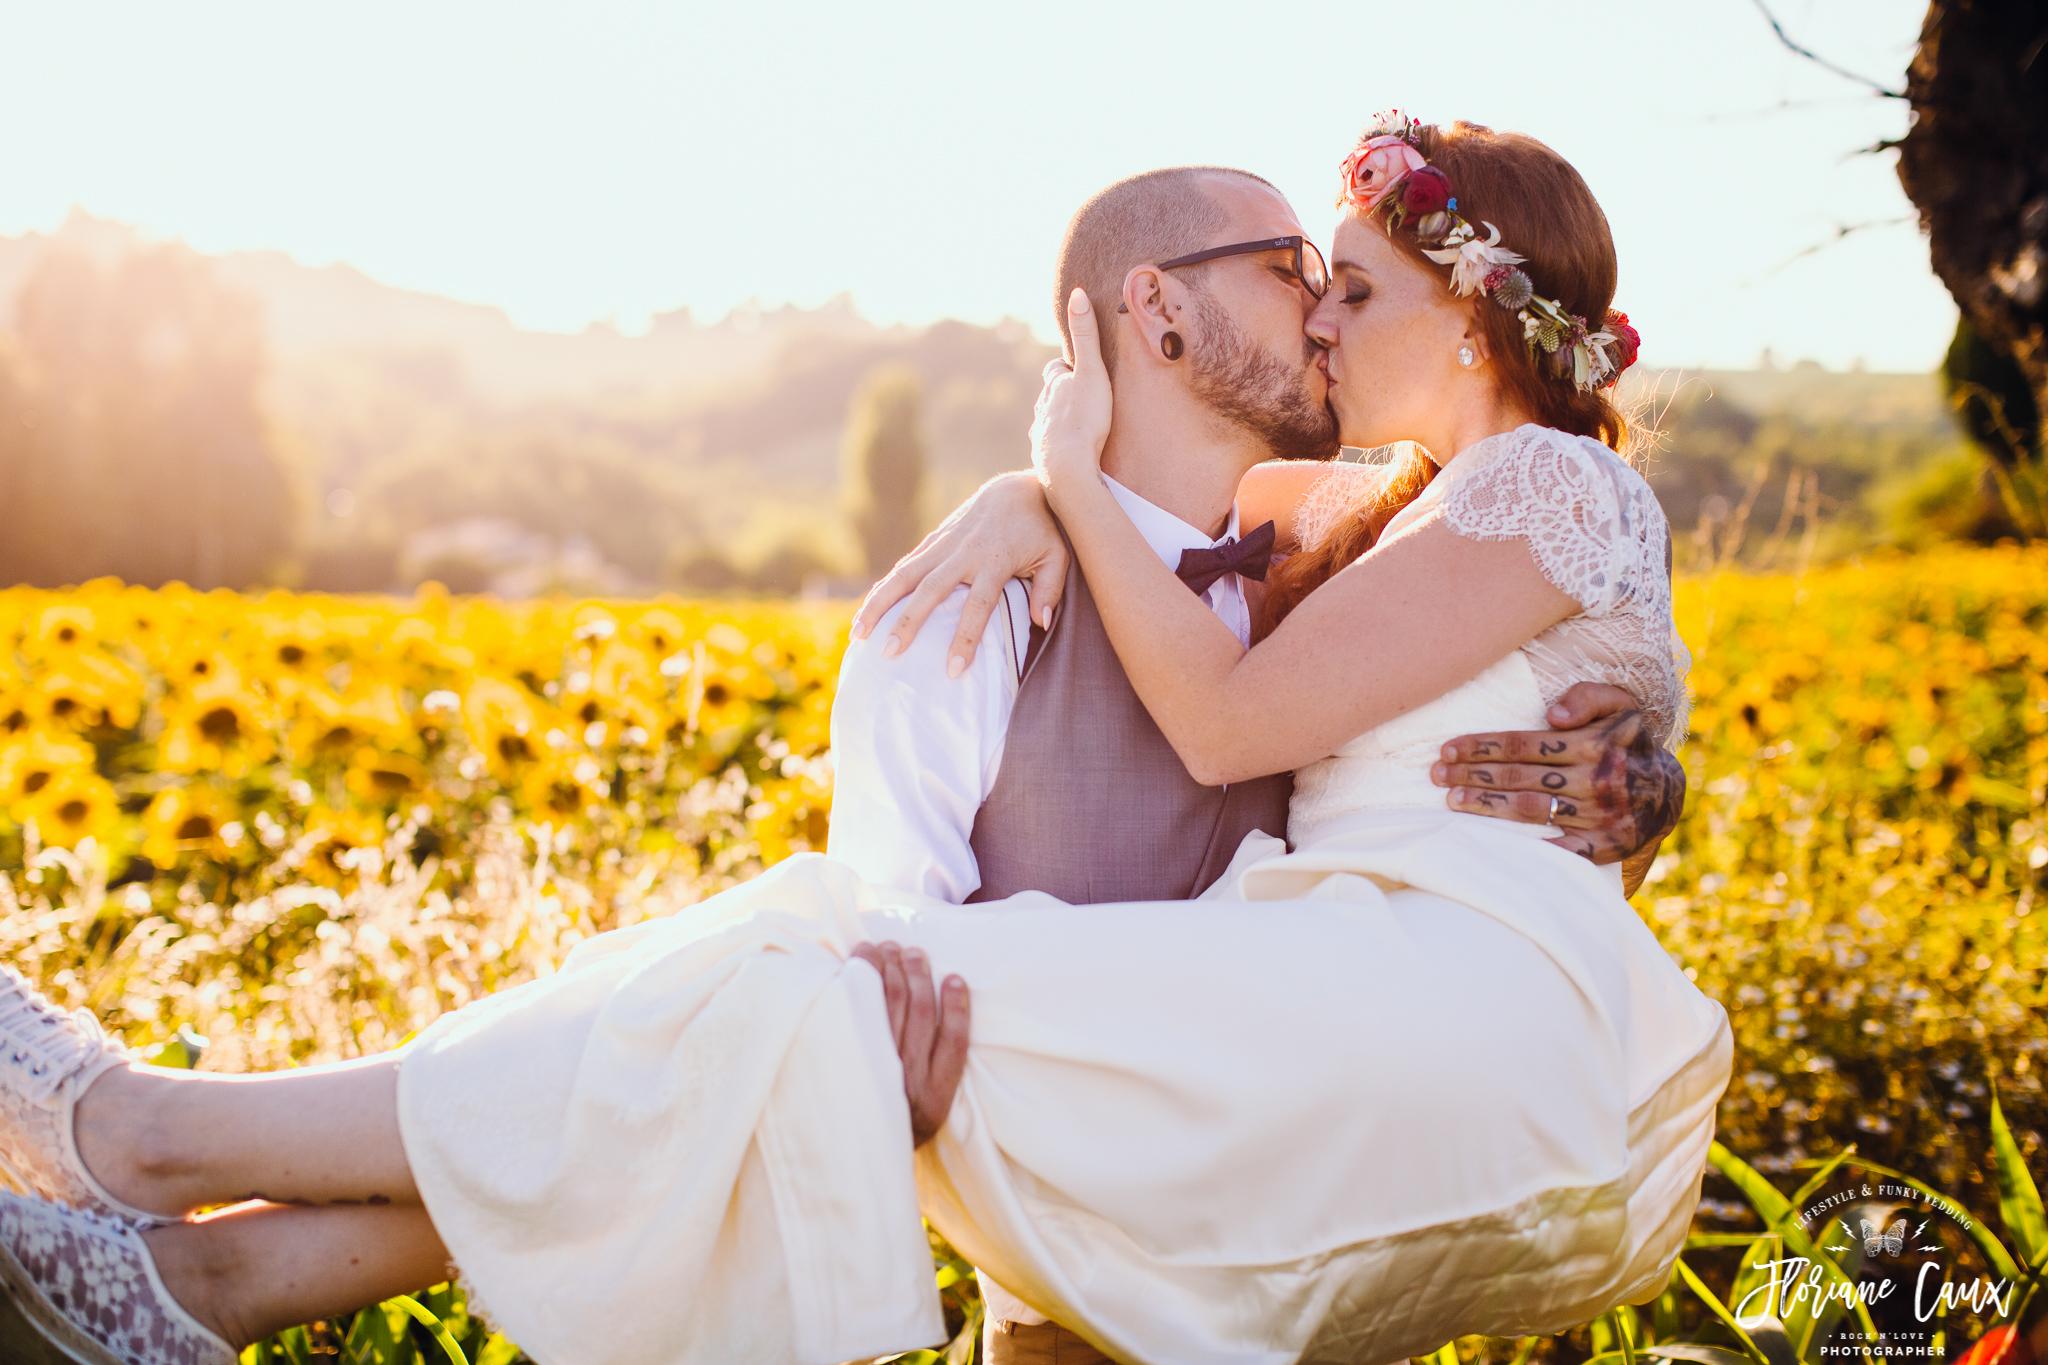 photographe-mariage-toulouse-rocknroll-maries-tatoues-floriane-caux-60